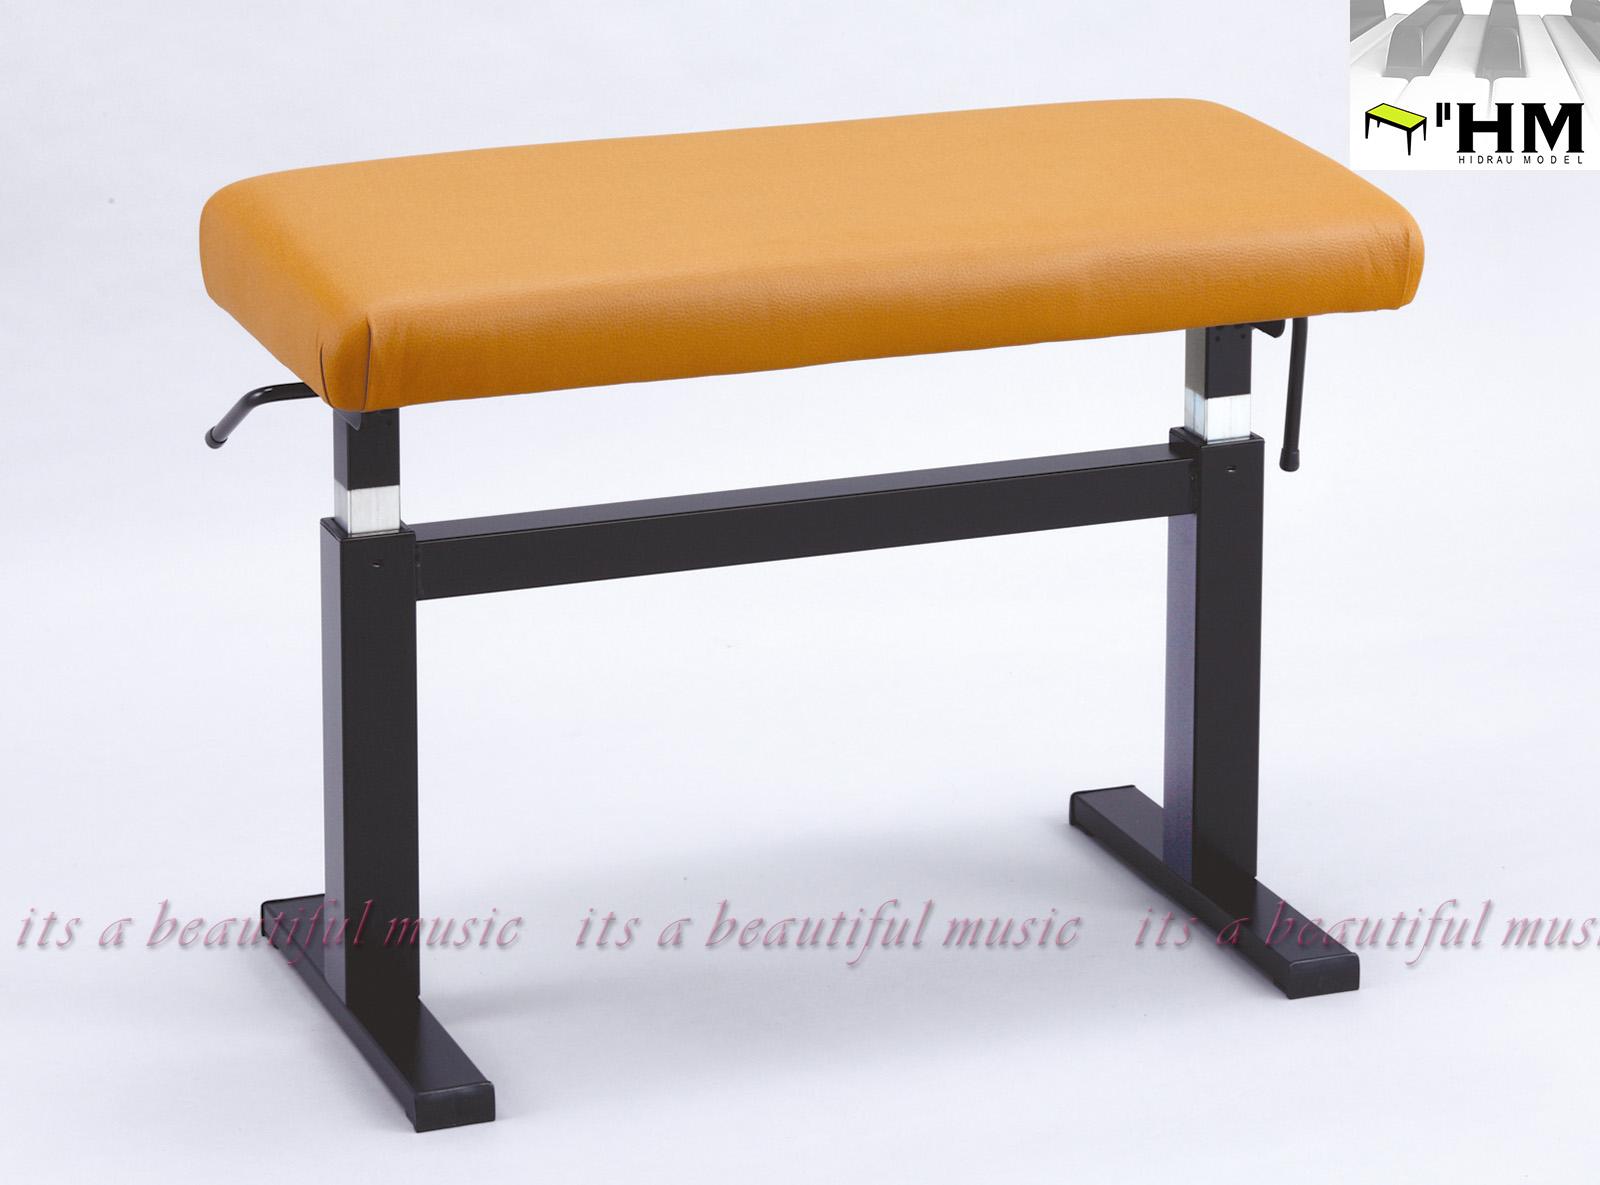 【its】スペイン/HIDRAU社 ガススプリング式高級輸入ピアノ椅子 BM-45H(ブラウン座面)